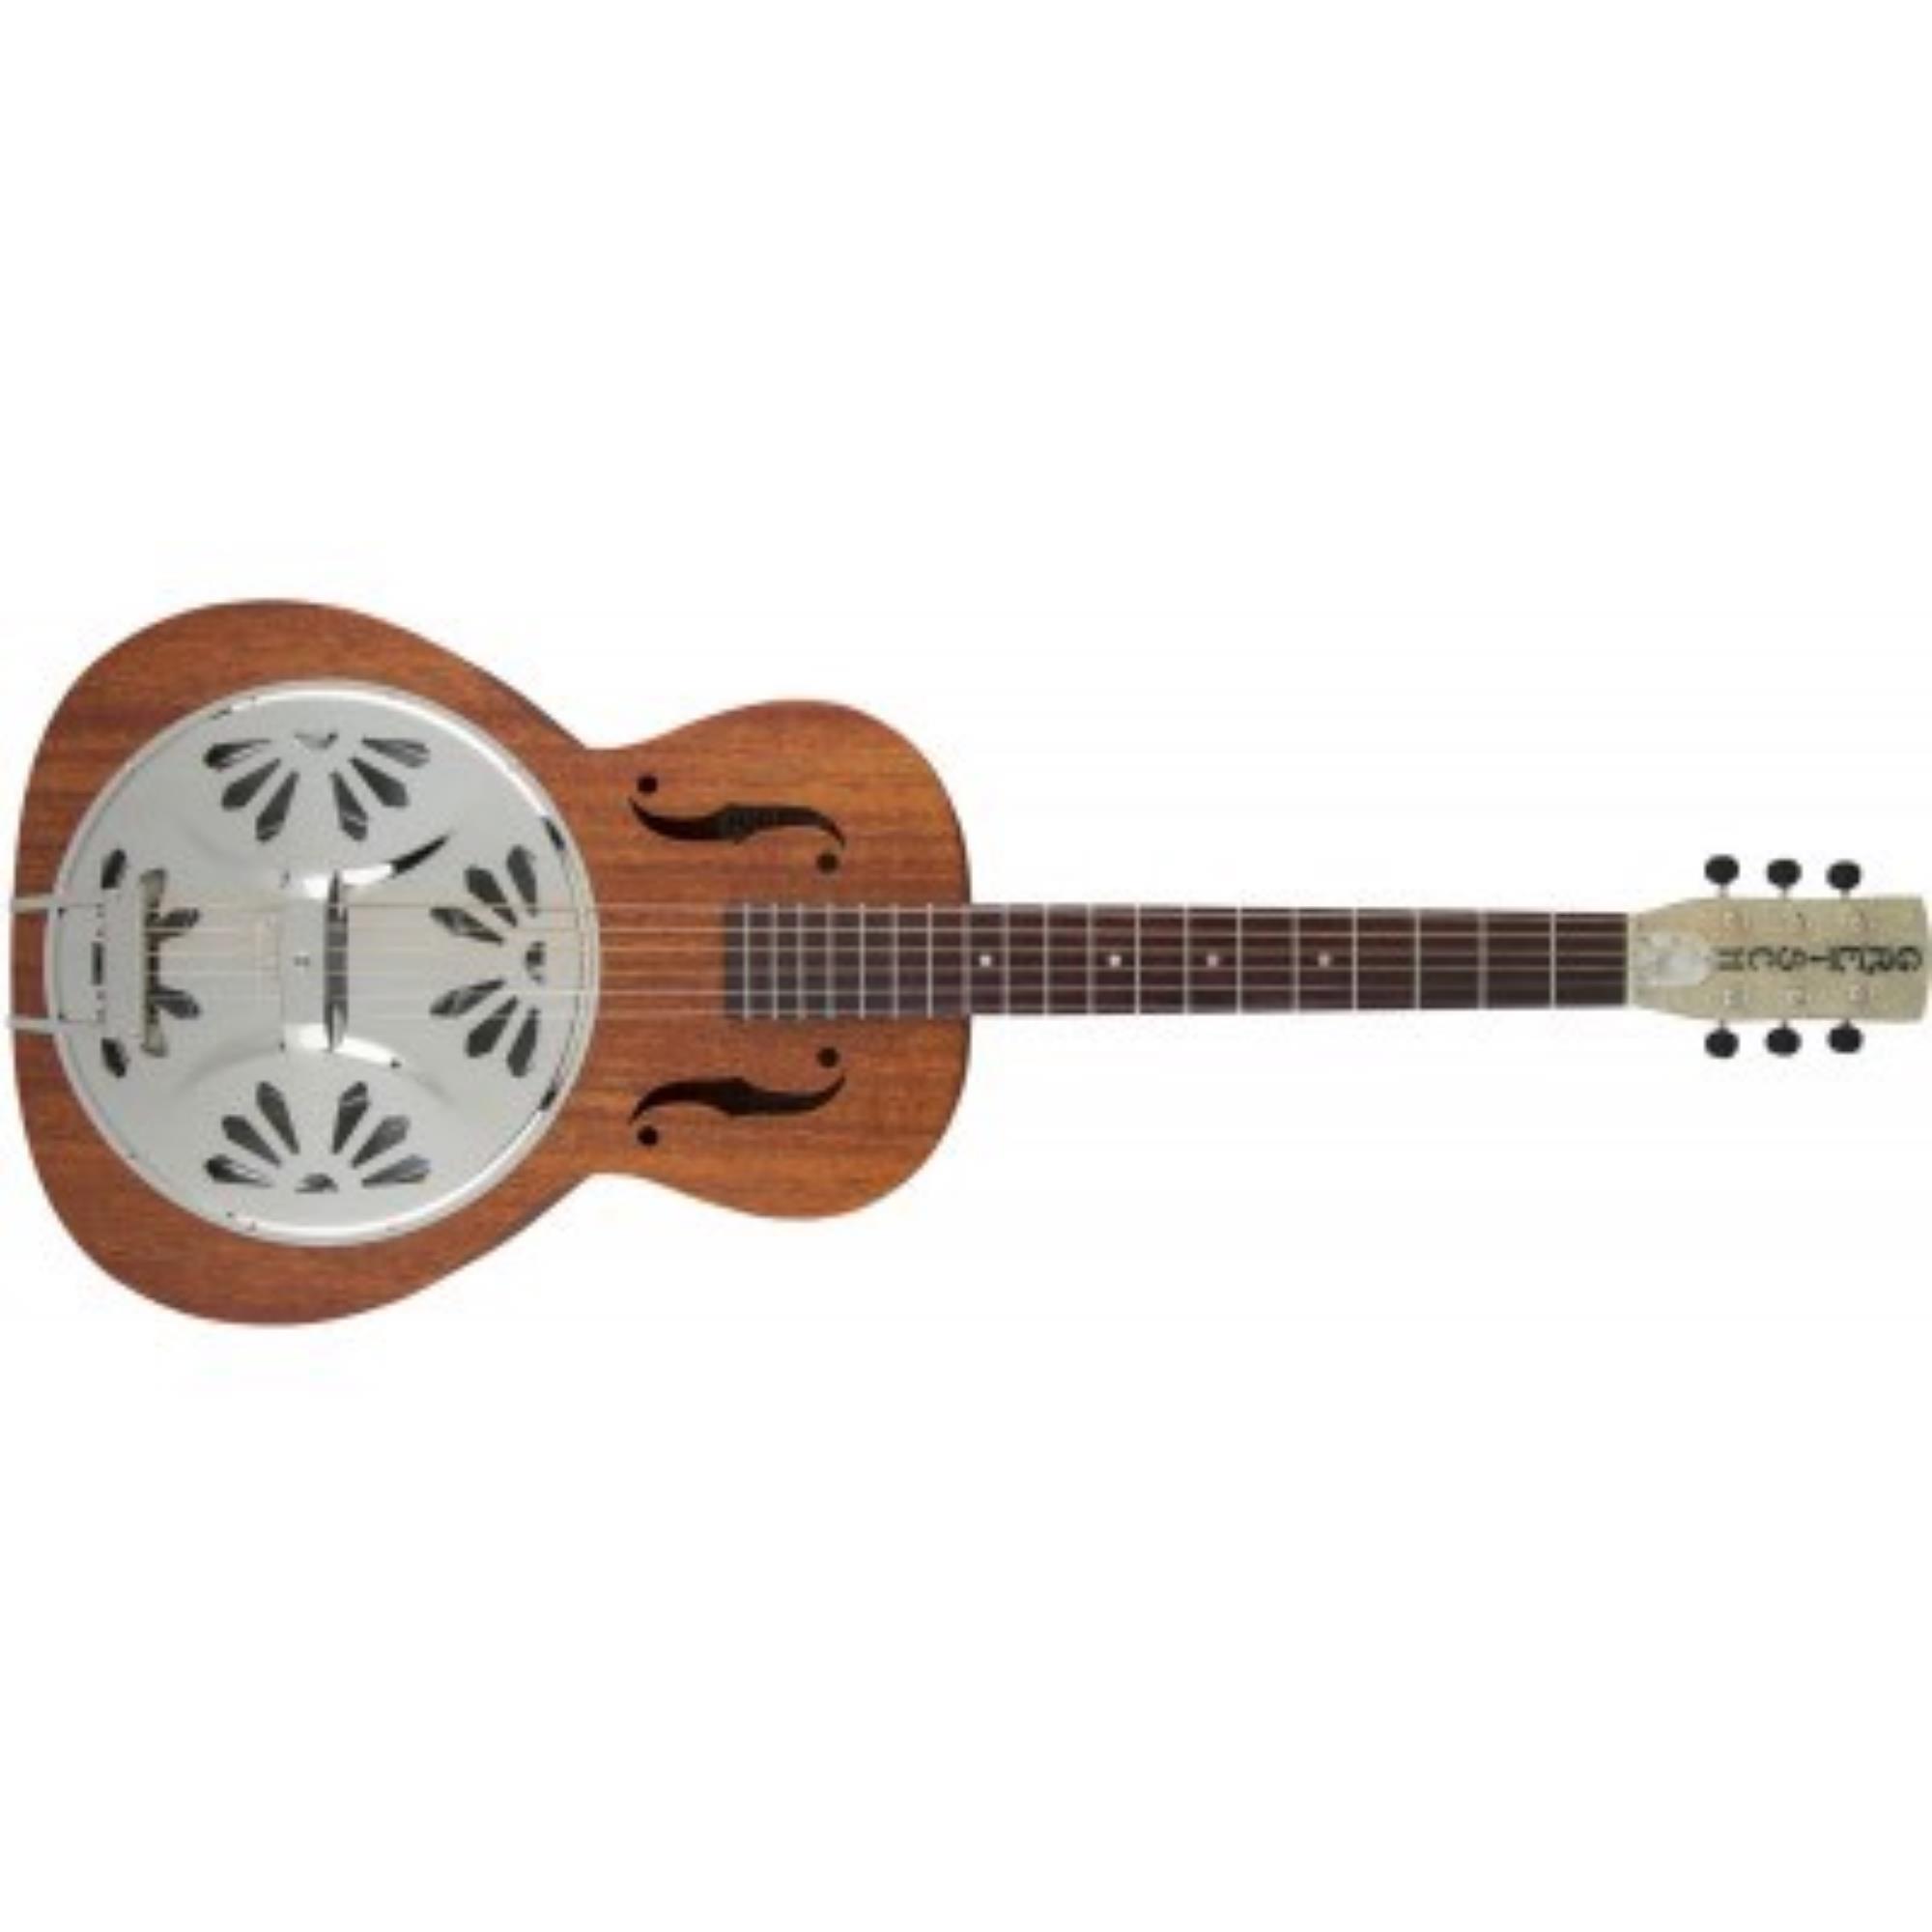 GRETSCH-G9200-Boxcar-Round-Neck-Resonator-Guitar-Natural-2715013521-sku-24363